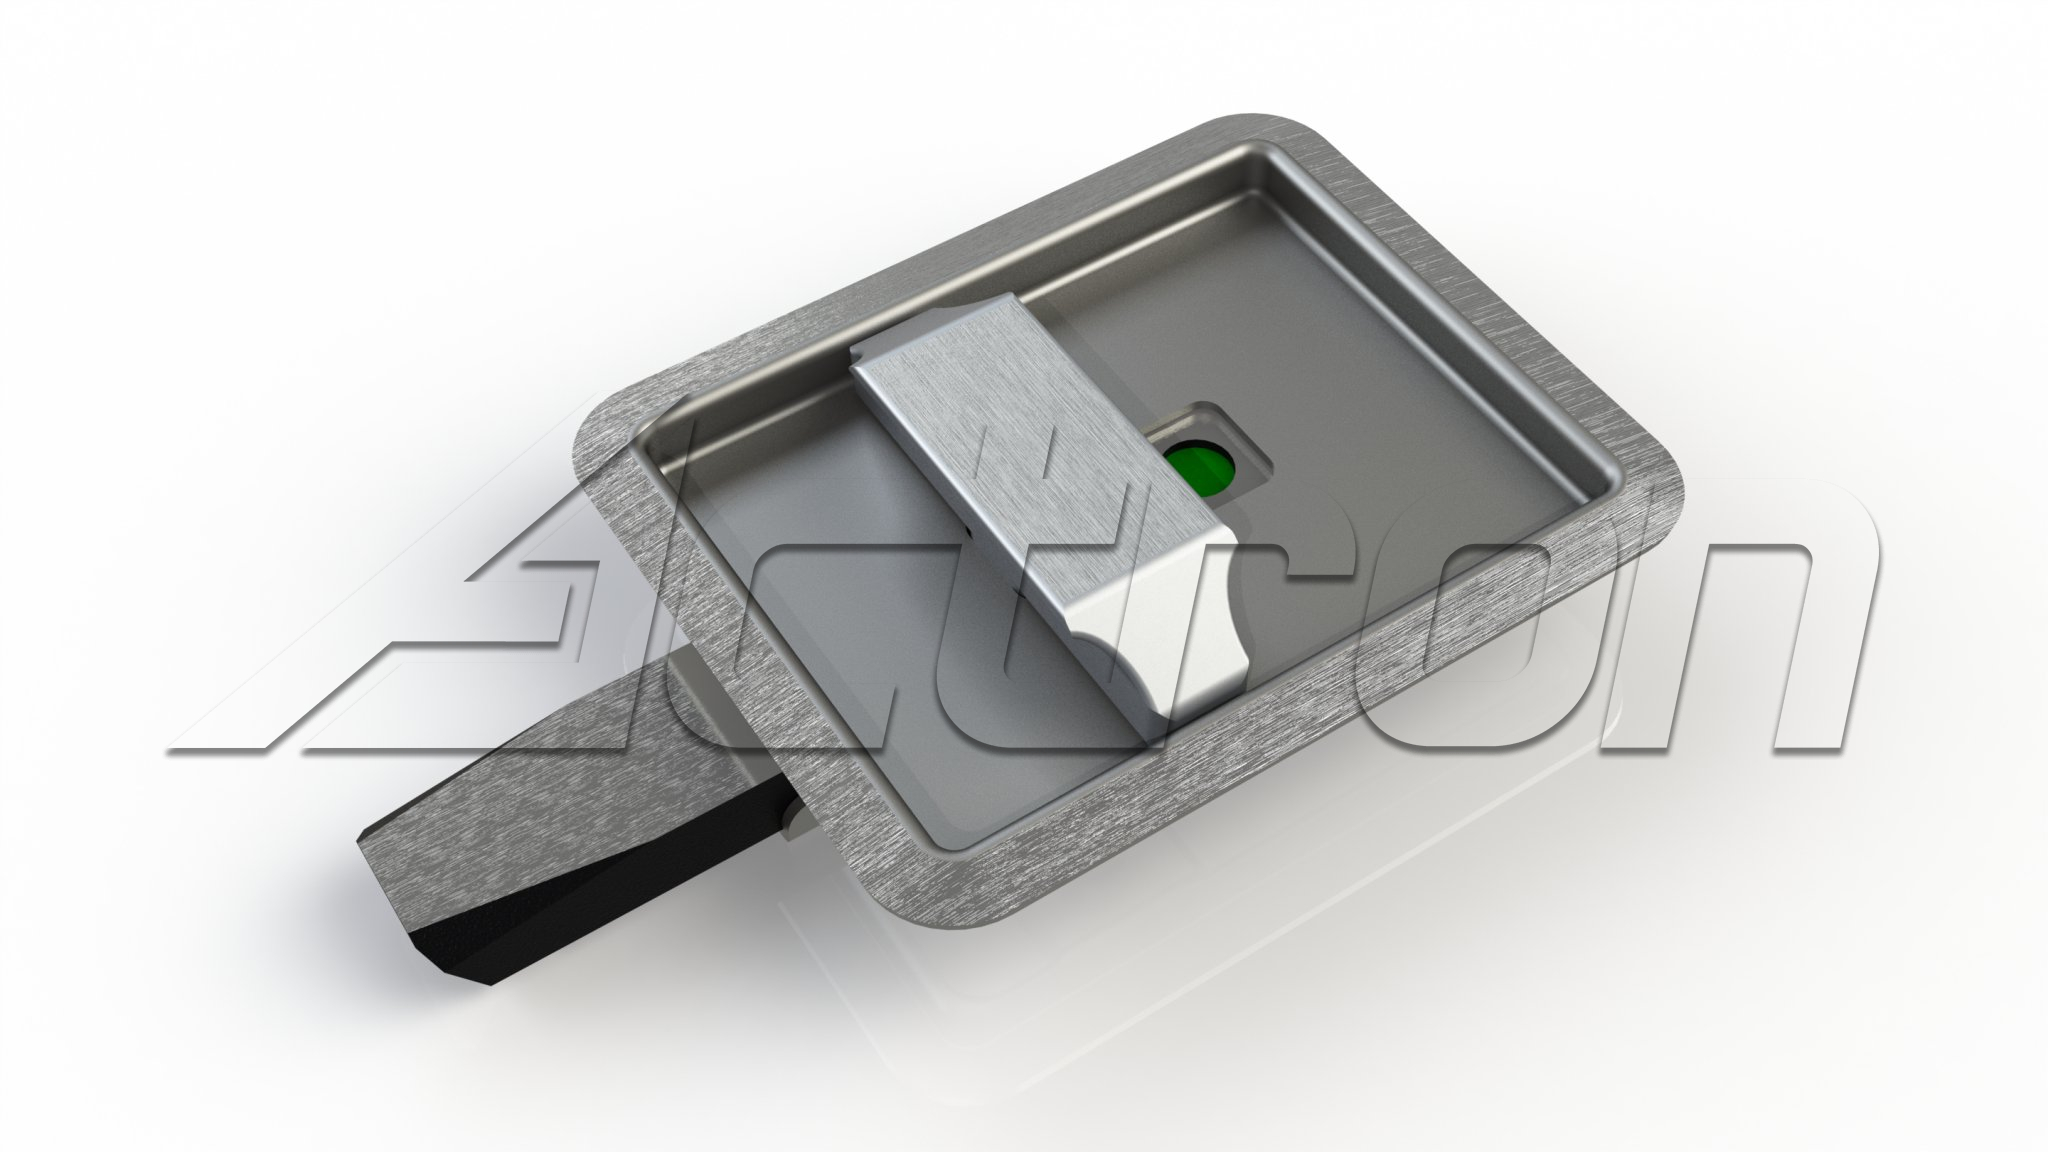 latch-assy-8211-sliding-4516-a27032.jpg